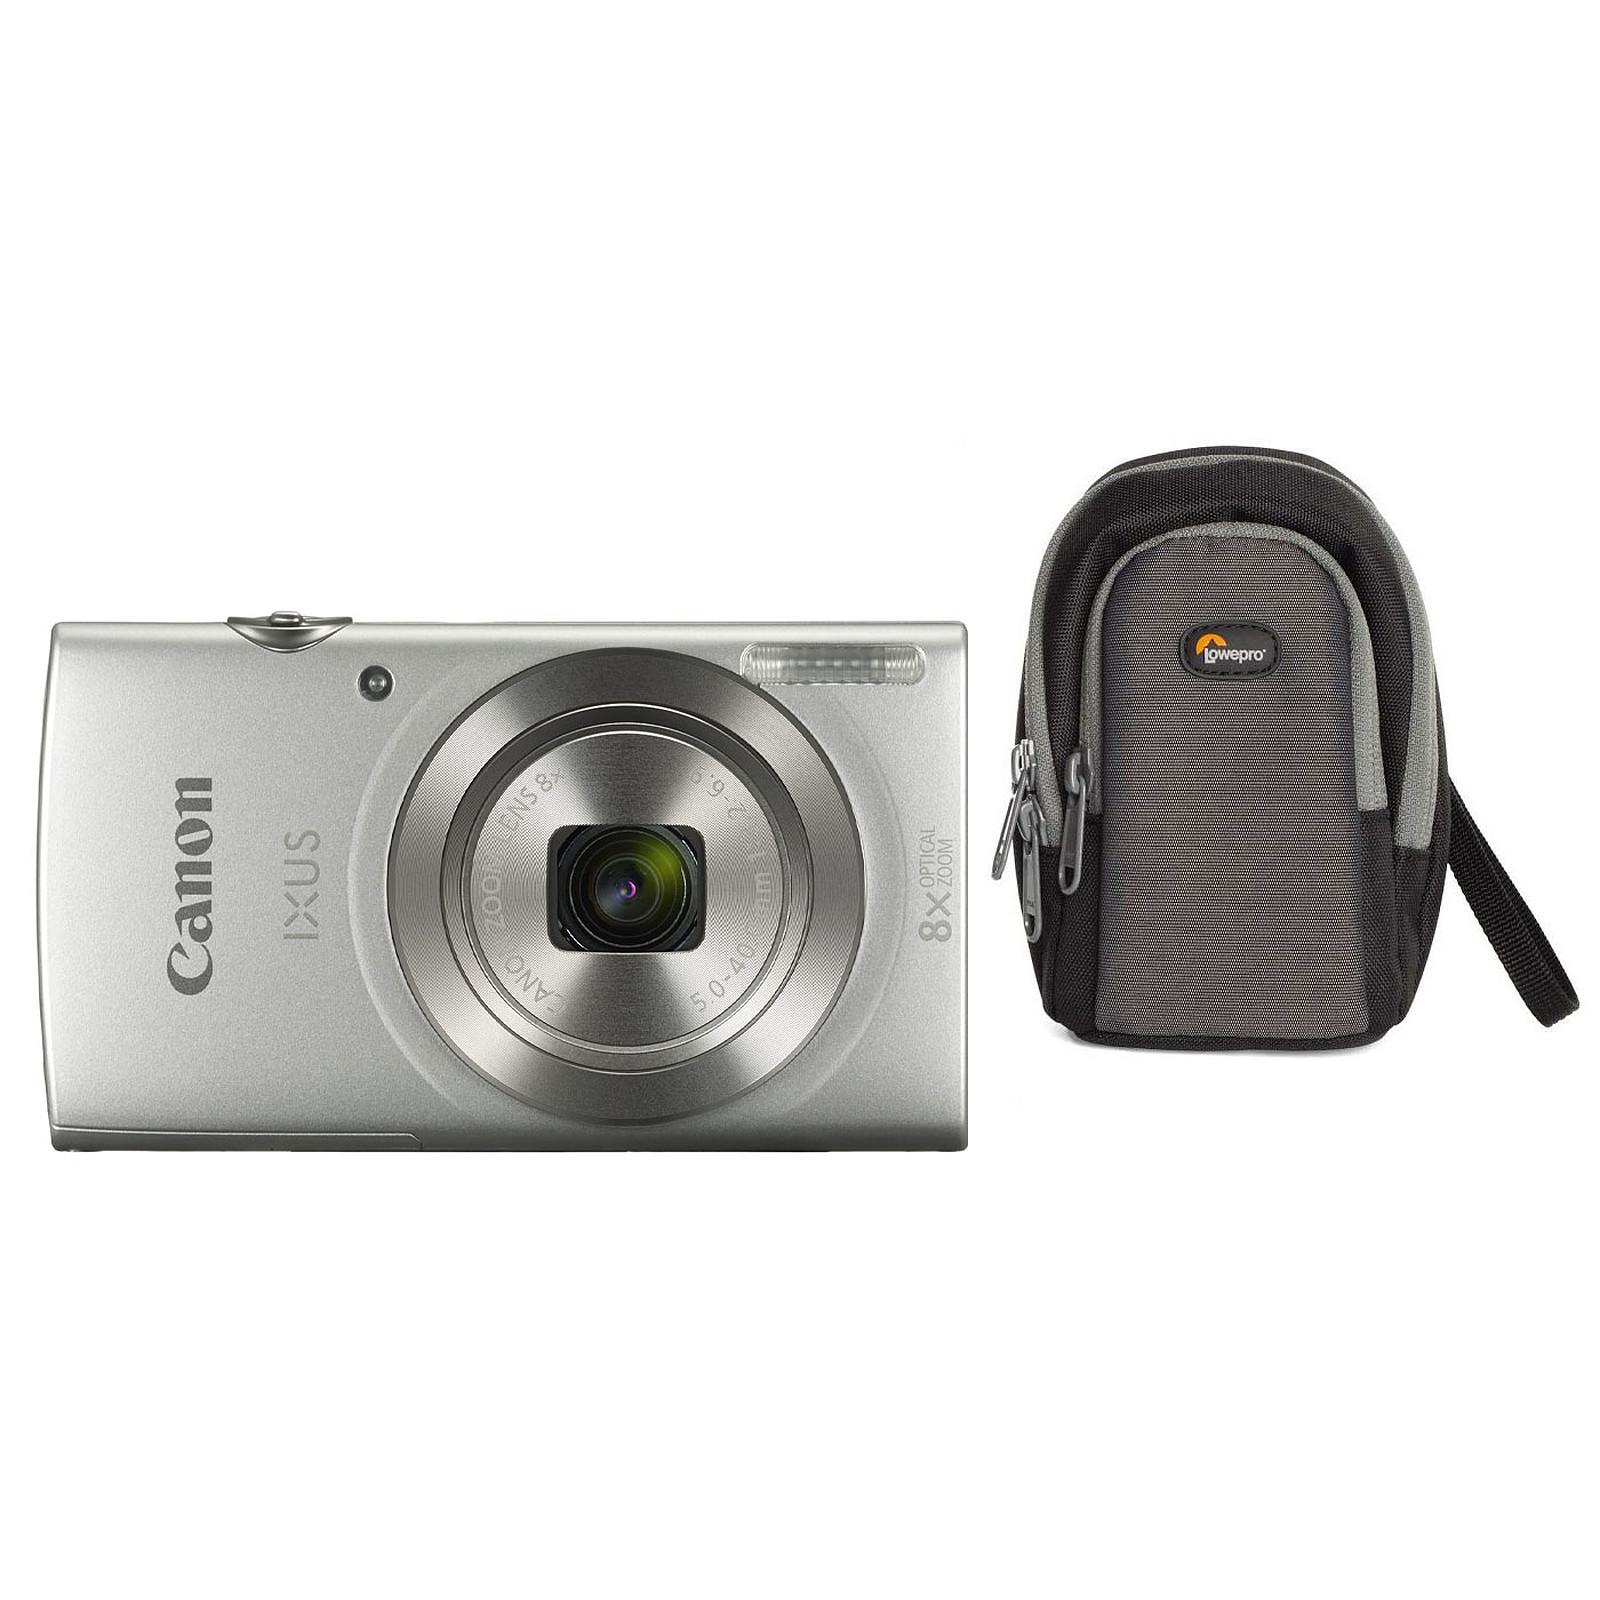 Canon IXUS 185 Argent + Lowepro Portland 30 Noir